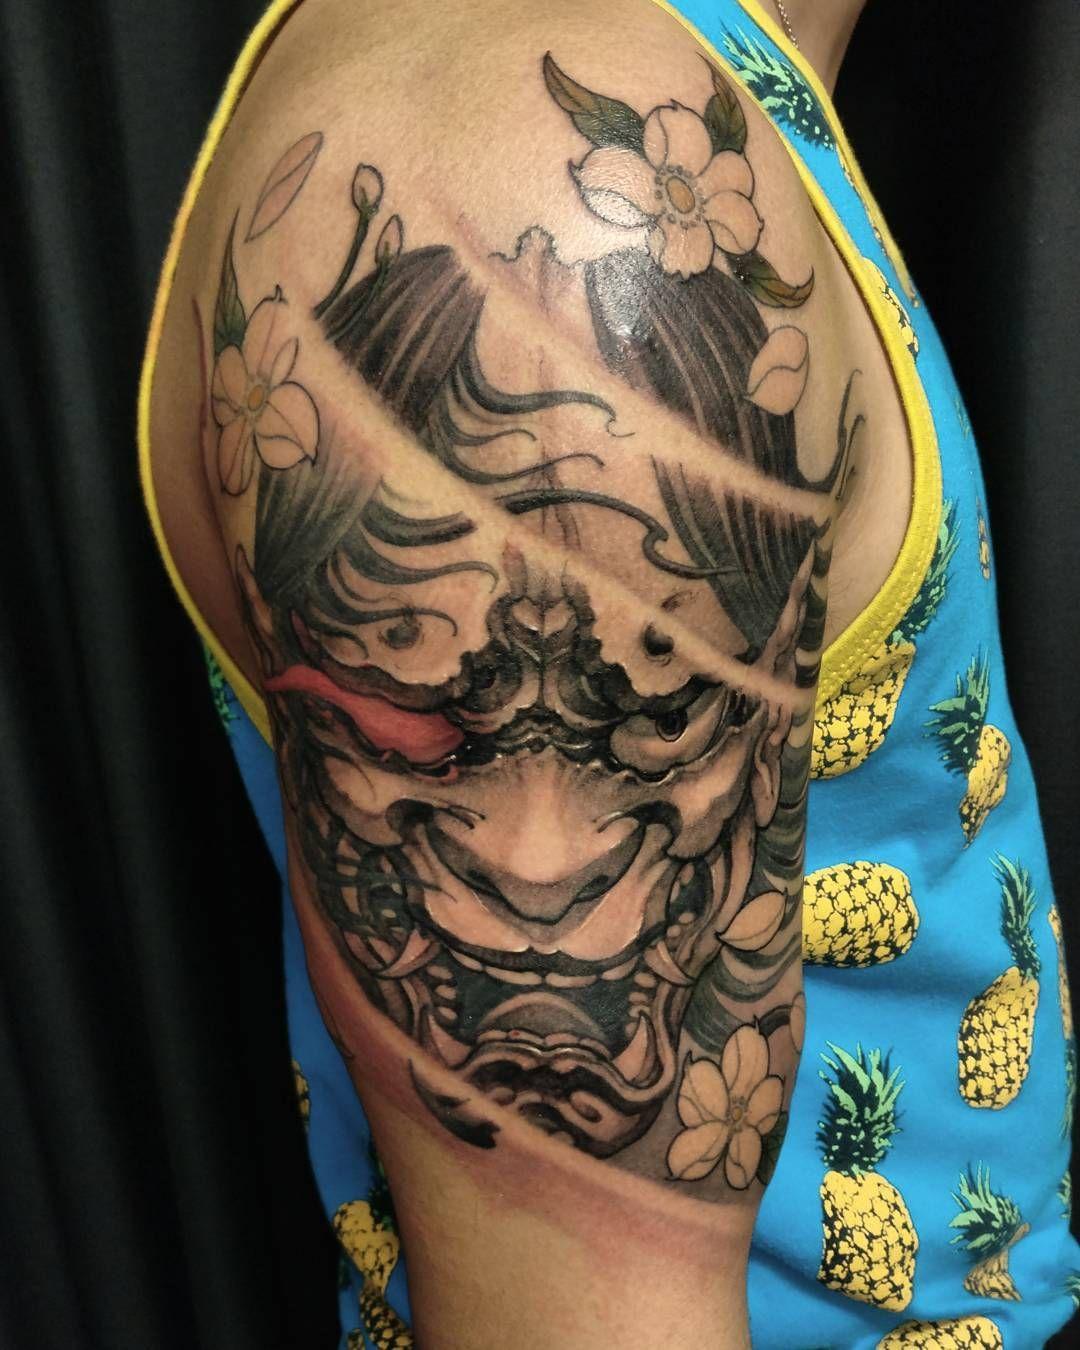 Hannya completed Tattoo ไอเดียรอยสัก, รอยสักแขน, รอยสักบนแขน